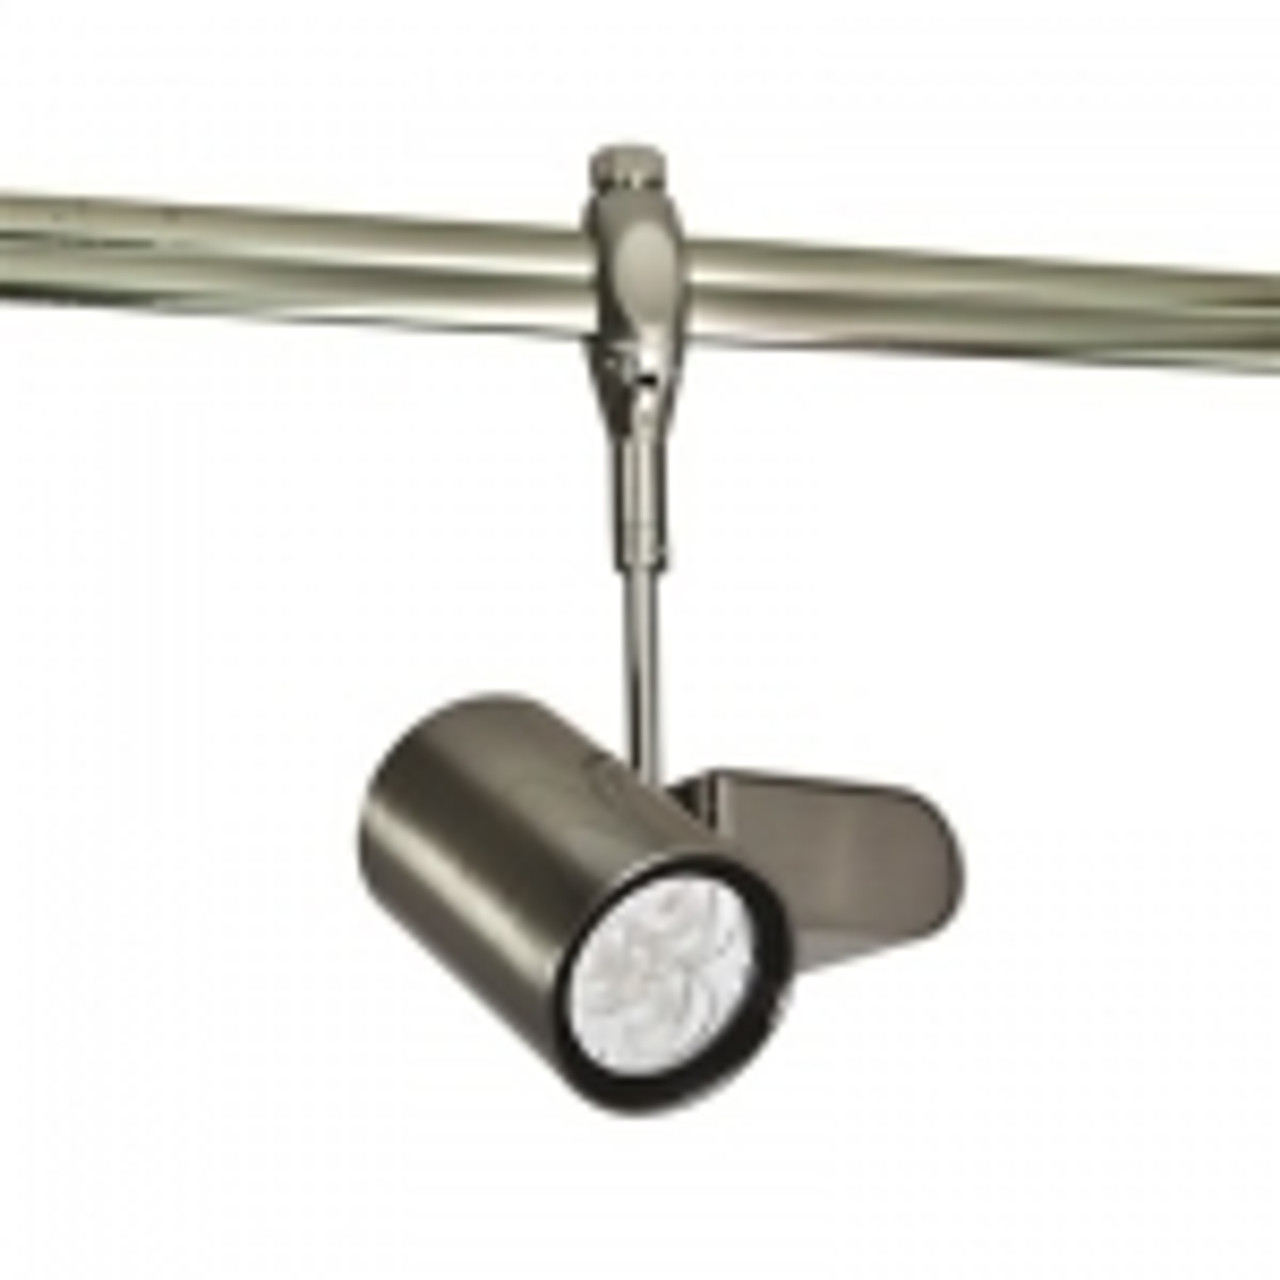 LED Rail Light Fixtures